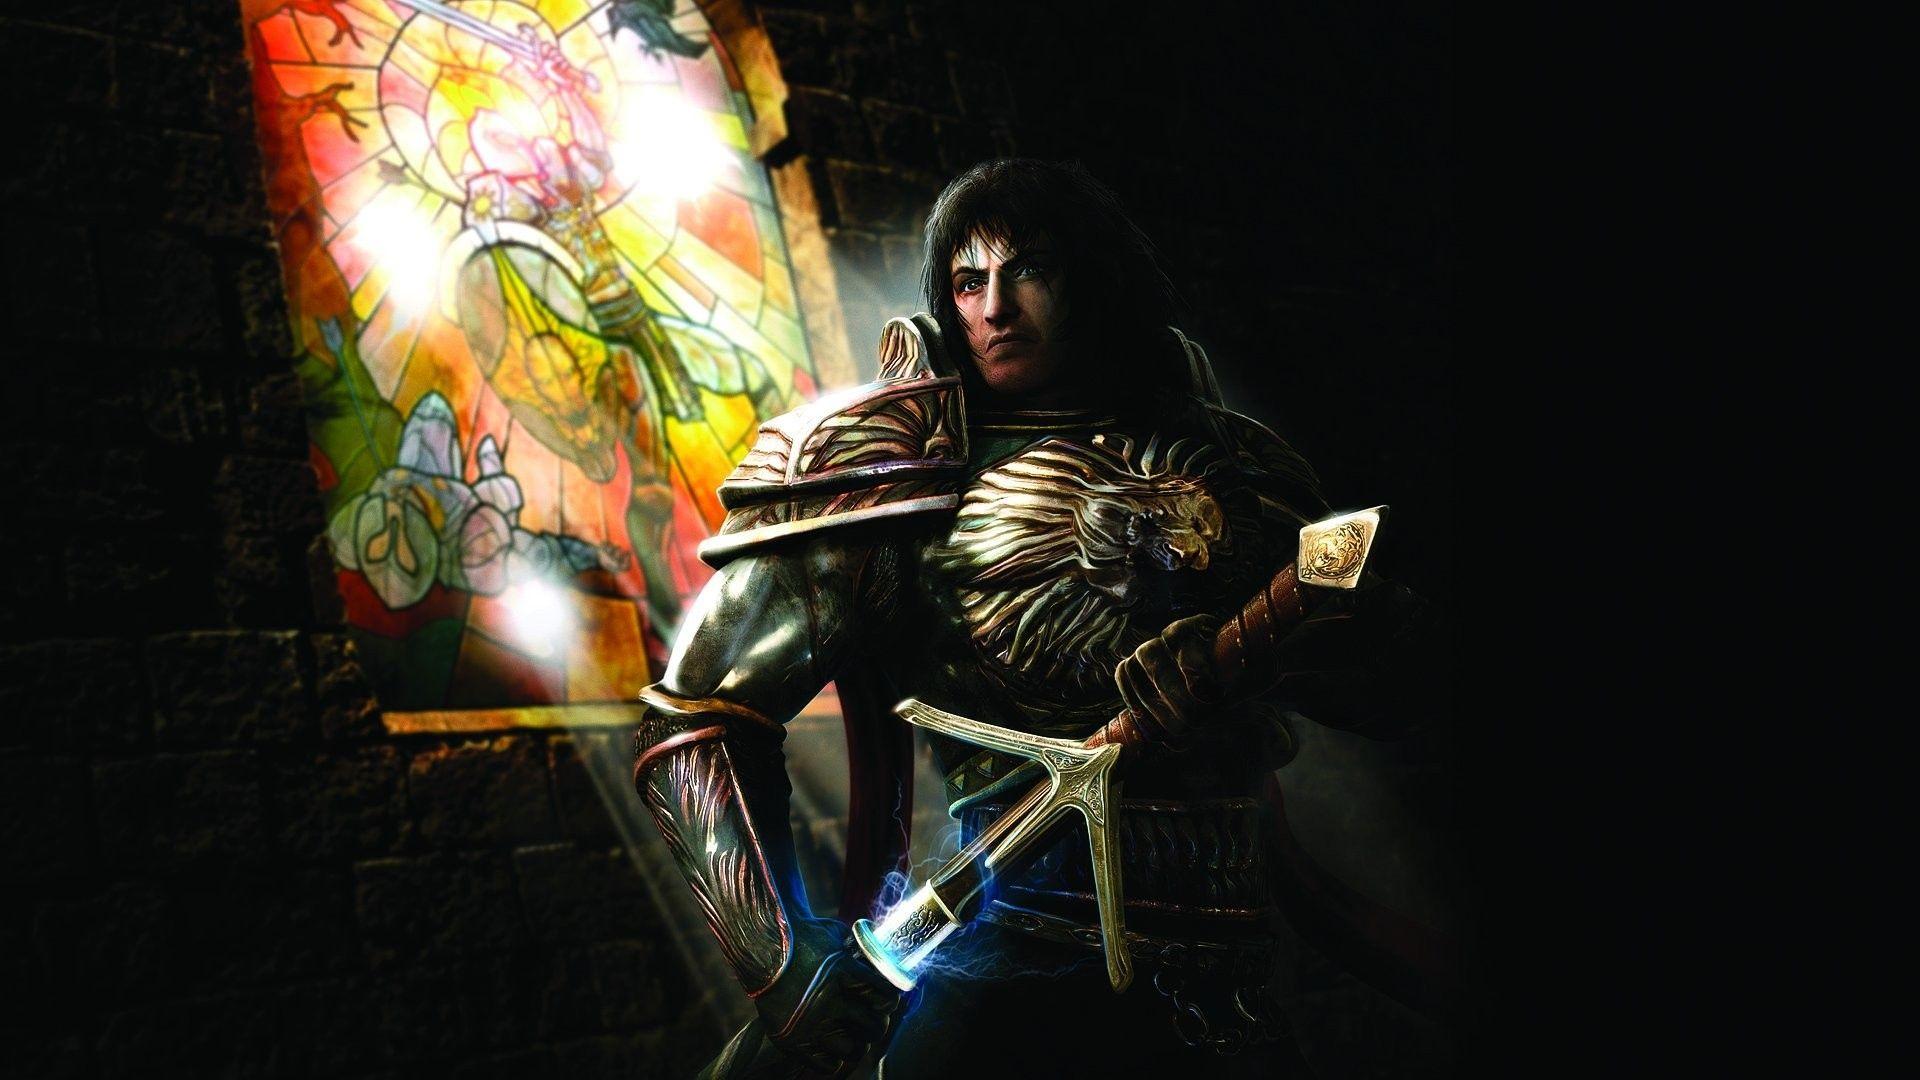 Beautiful Dungeon Siege Warrior Sword Window Light Download Image Pin HD Wallpapers